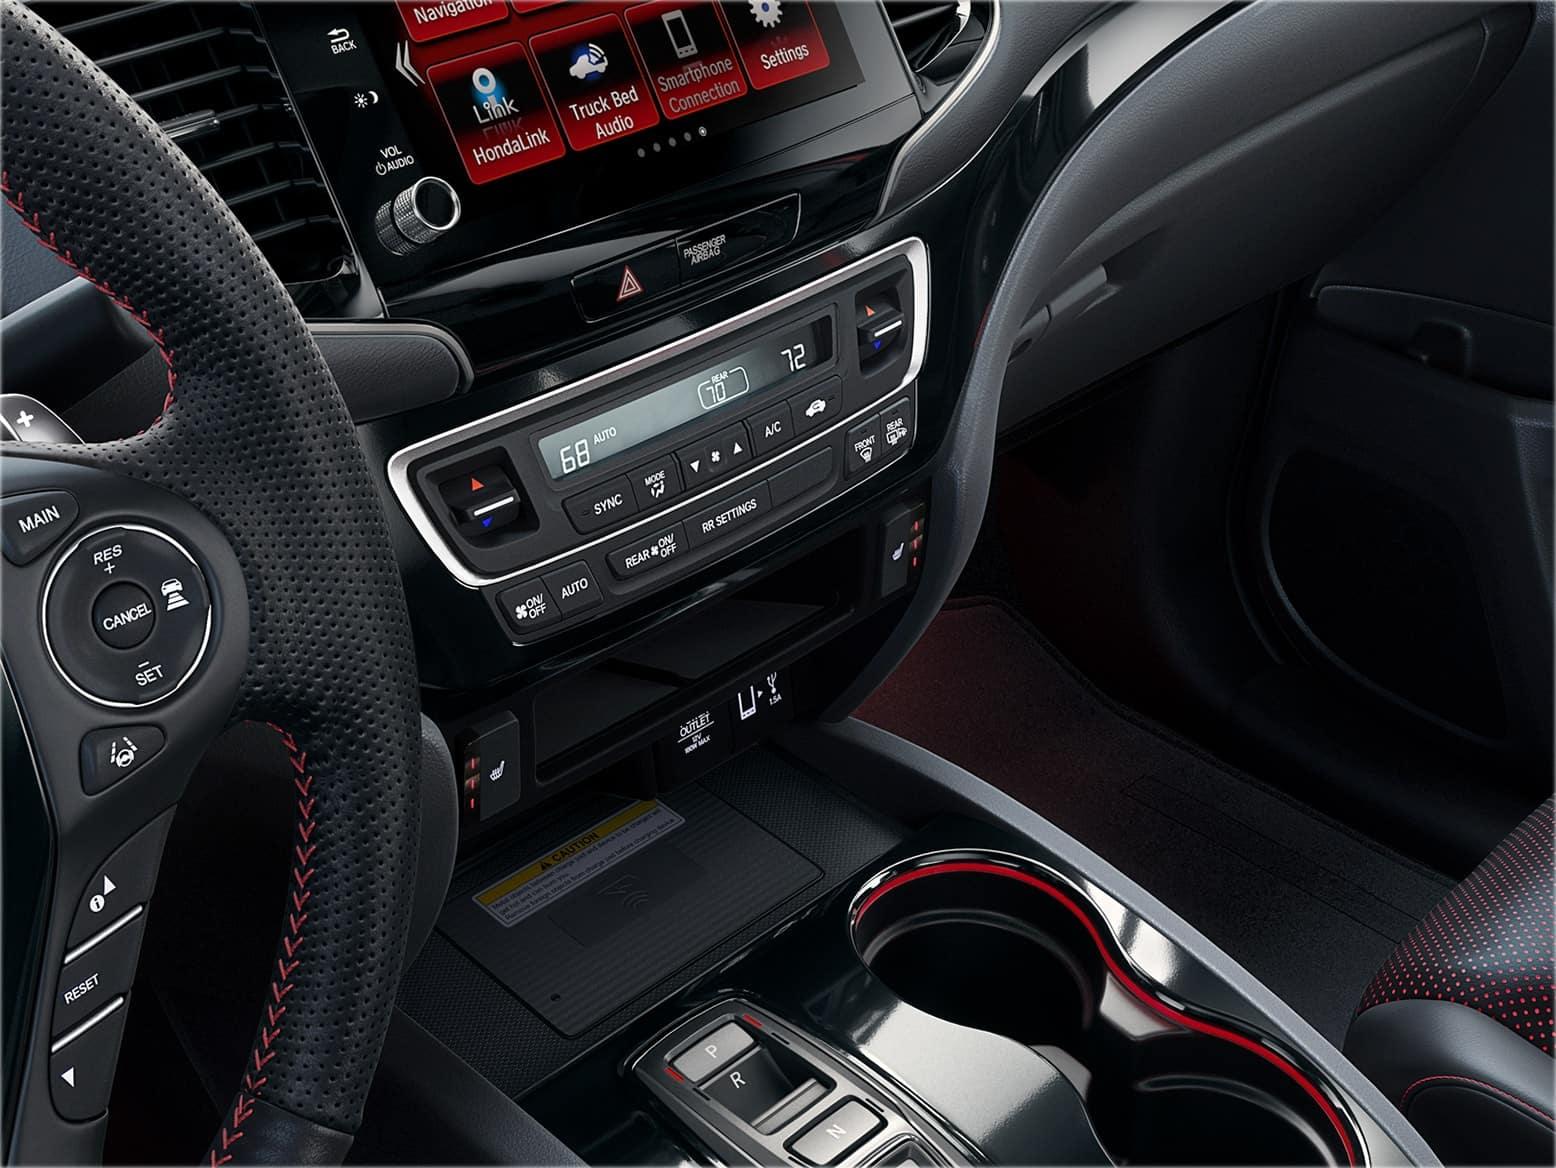 2021 Honda Ridgeline with red ambient interior lighting